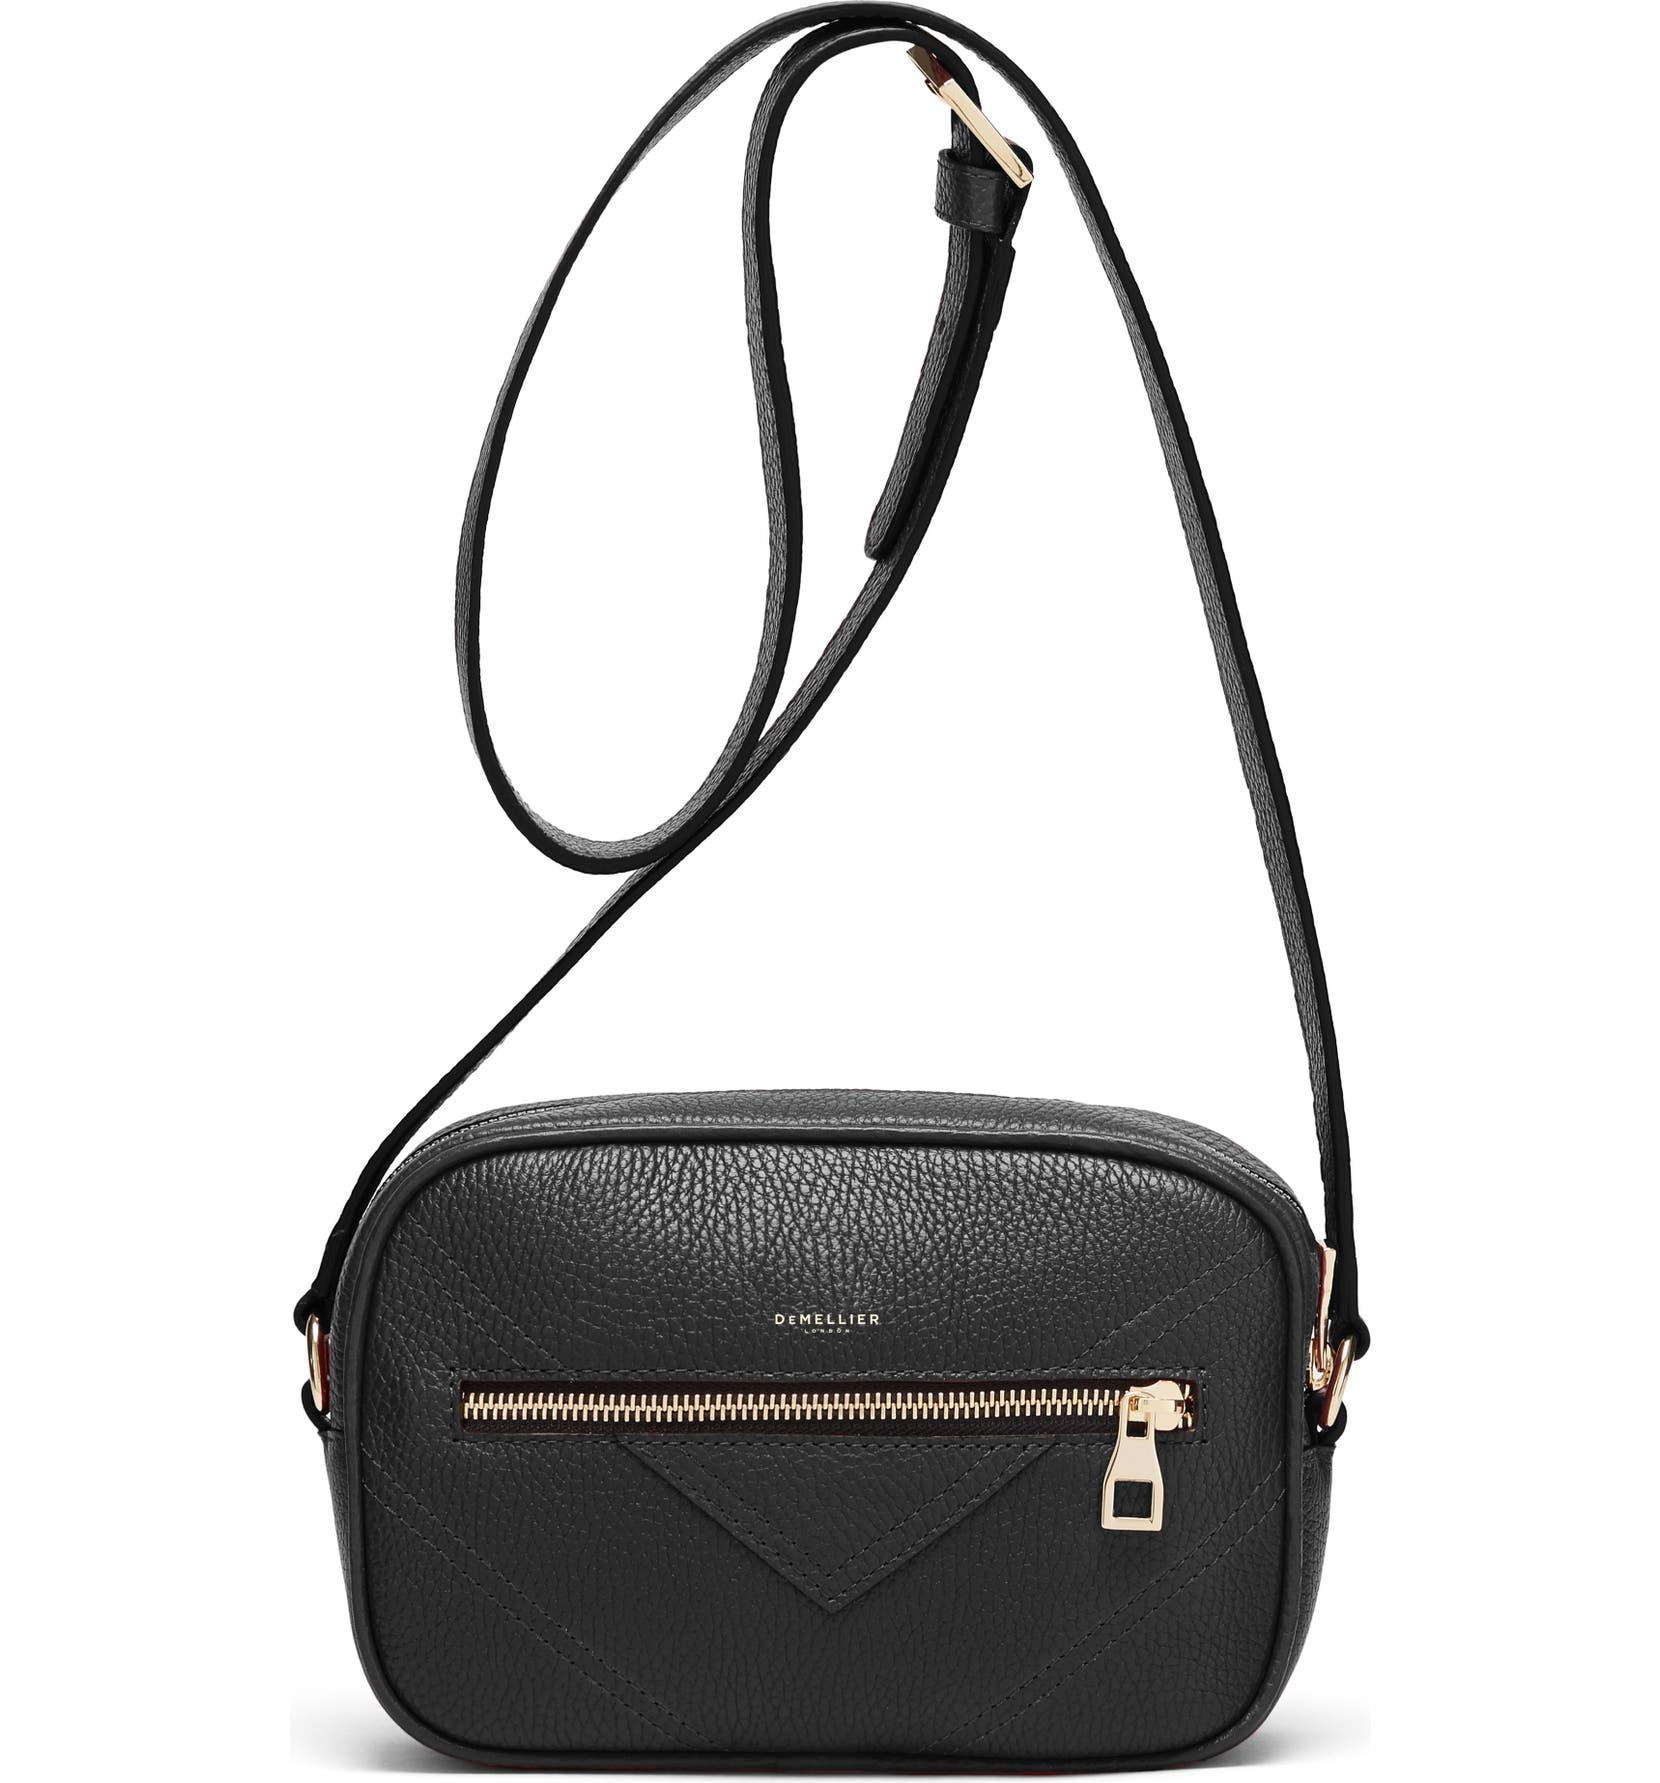 69c3328bdc3 Manhattan Grained Leather Crossbody Bag